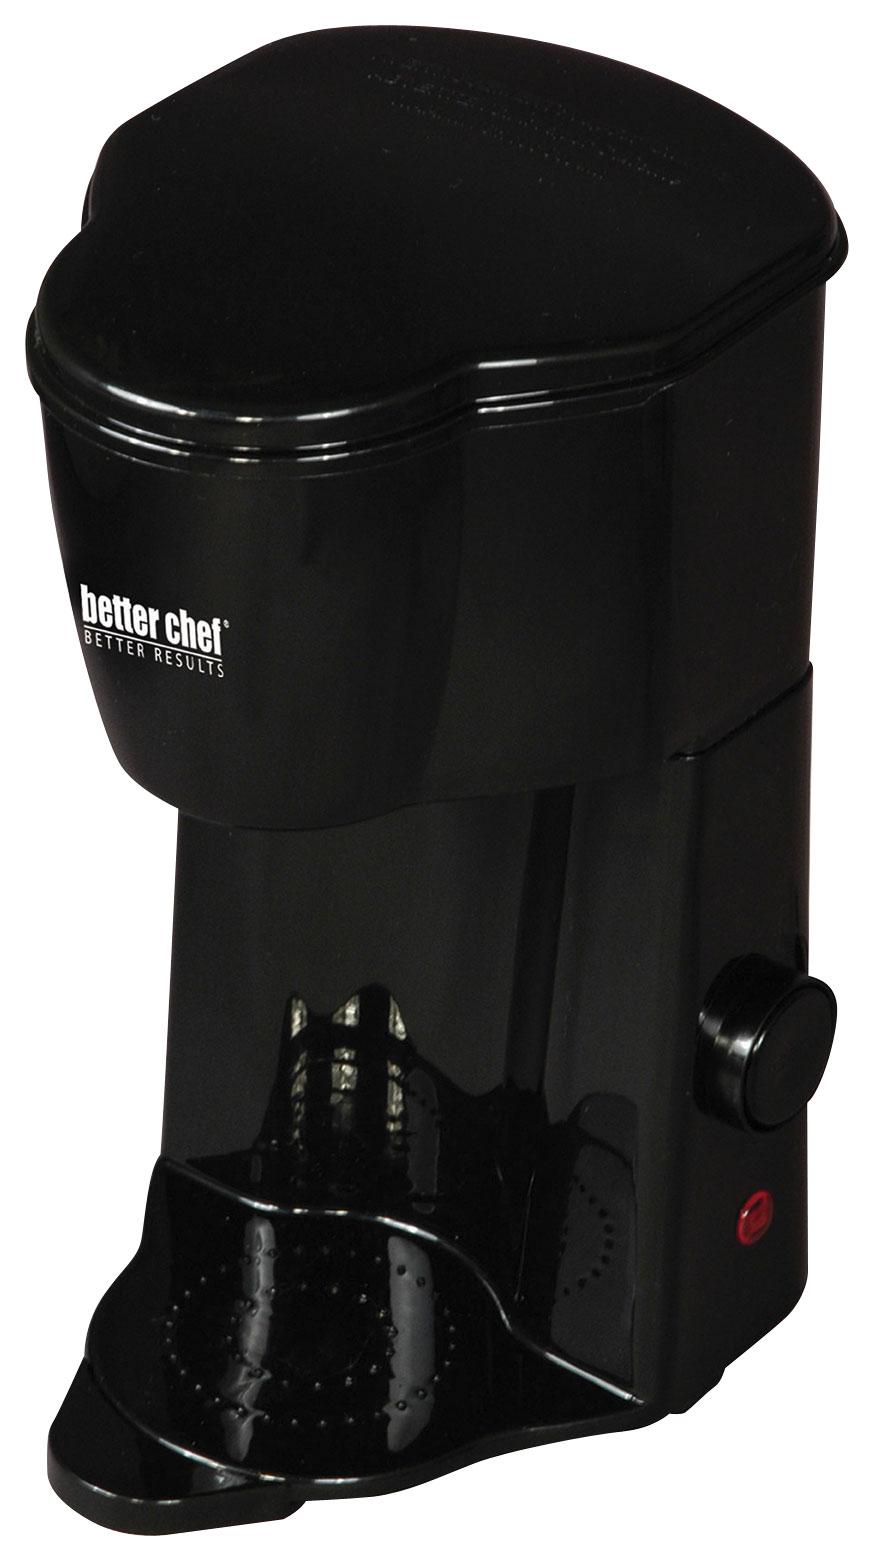 Better Chef - Personal Coffeemaker - Black 1613554